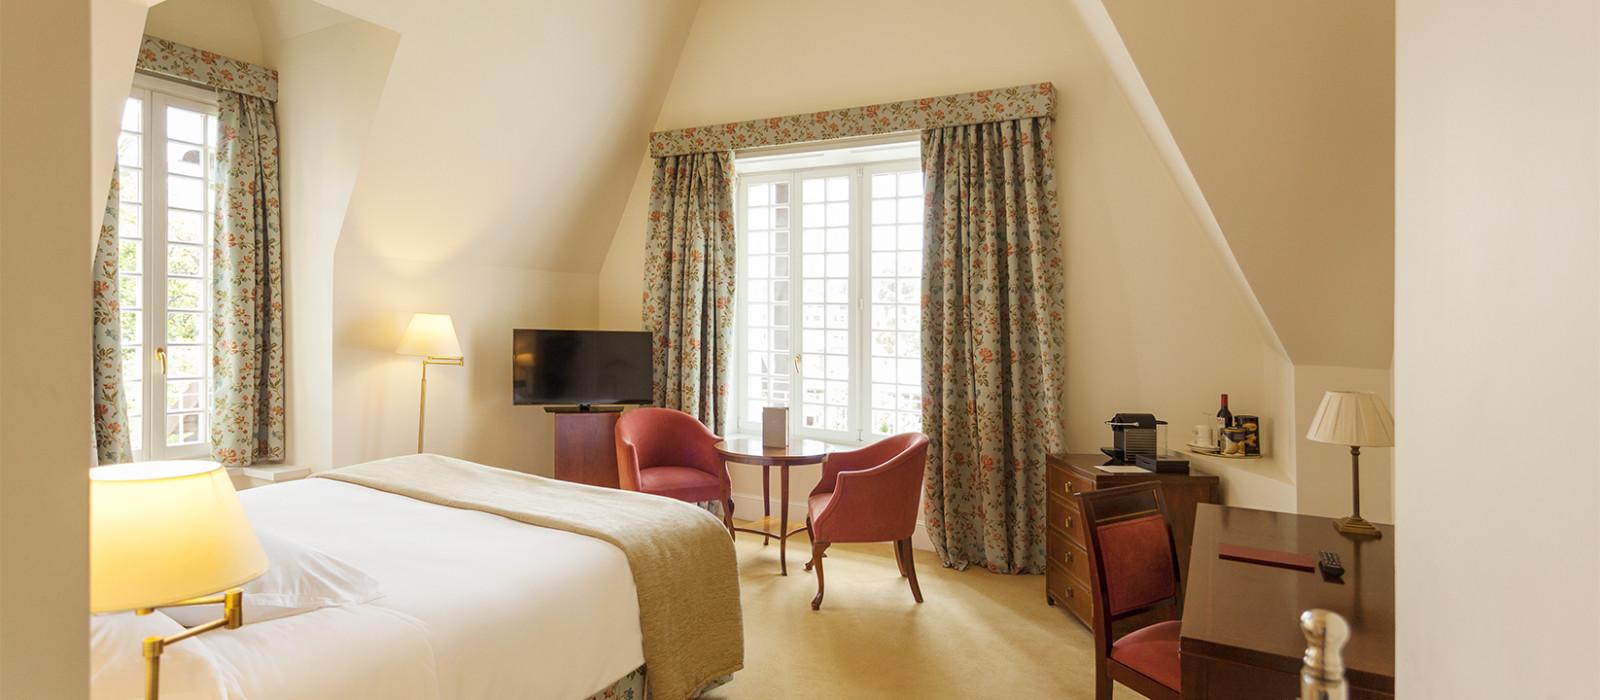 Hotel Villa Soro Spain